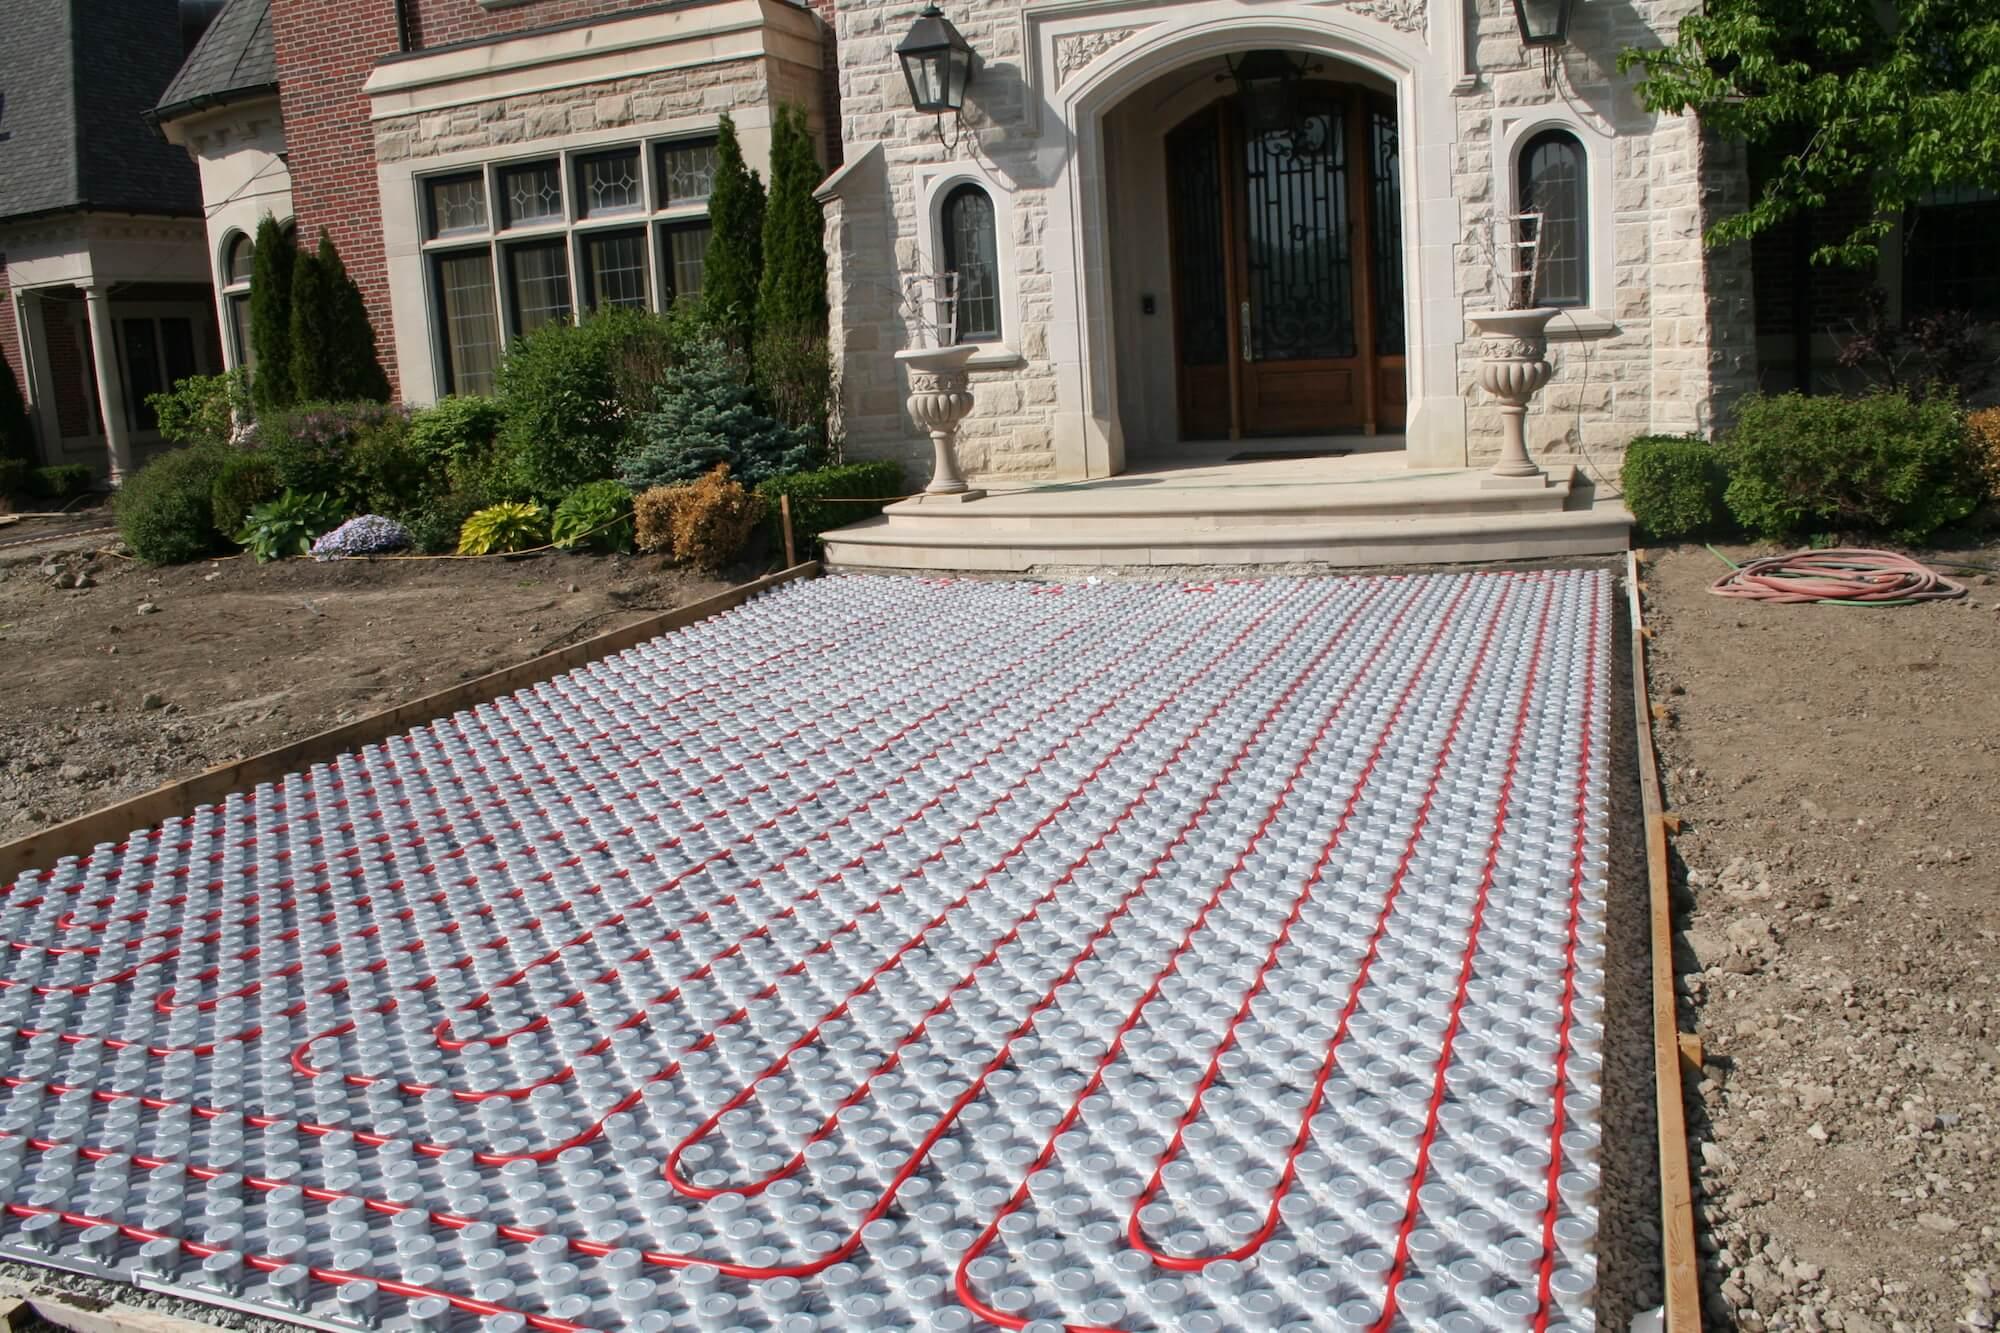 driveway  u0026 walkways  outdoor radiant heating panels